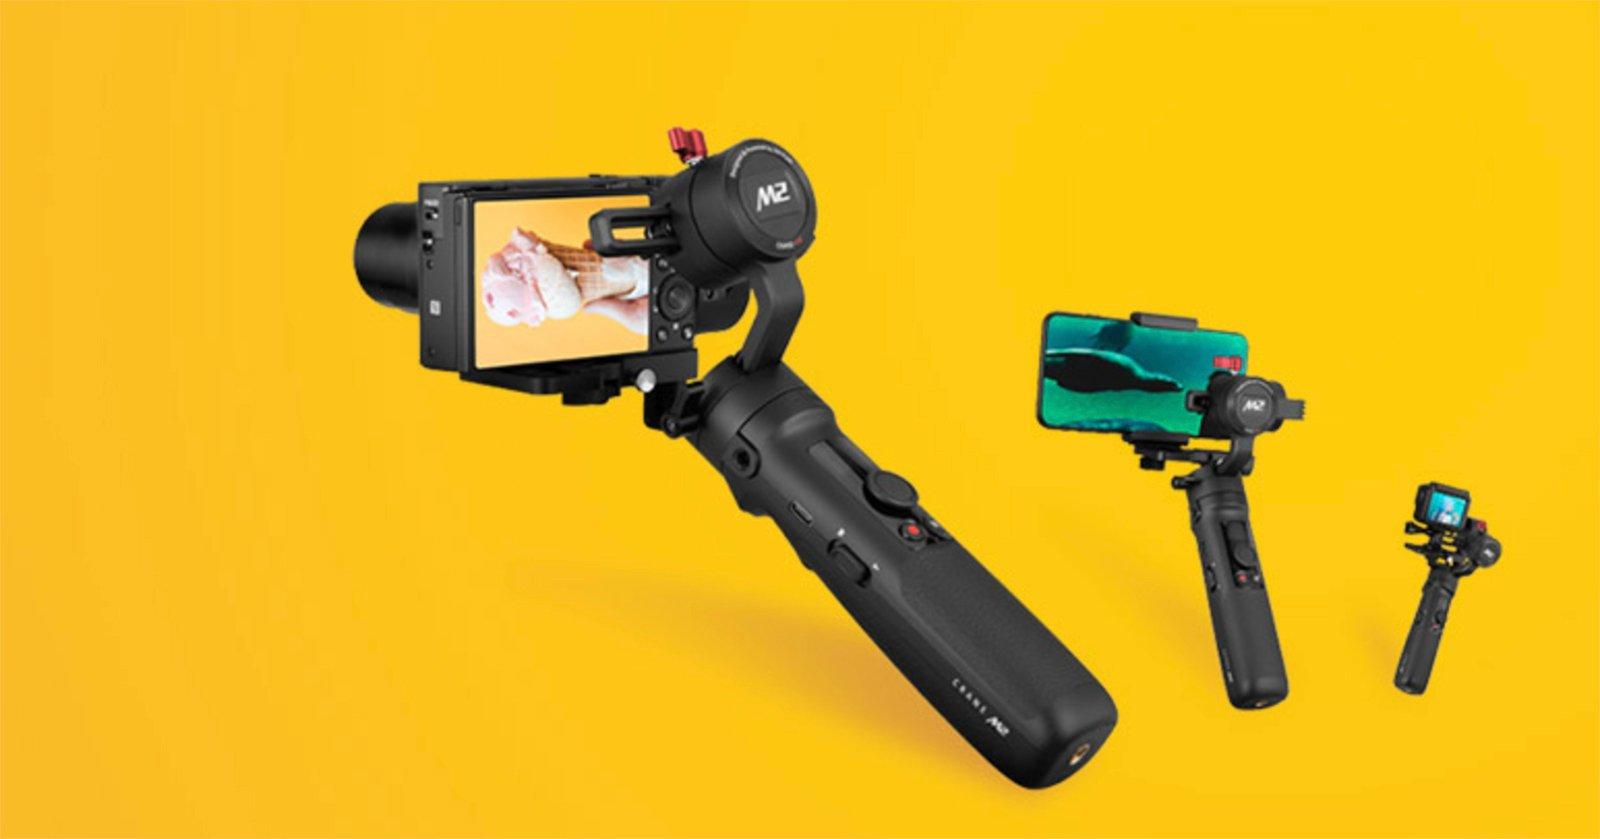 Zhiyun Unveils Cheap, Compact Crane-M2 Gimbal for Compact Cameras